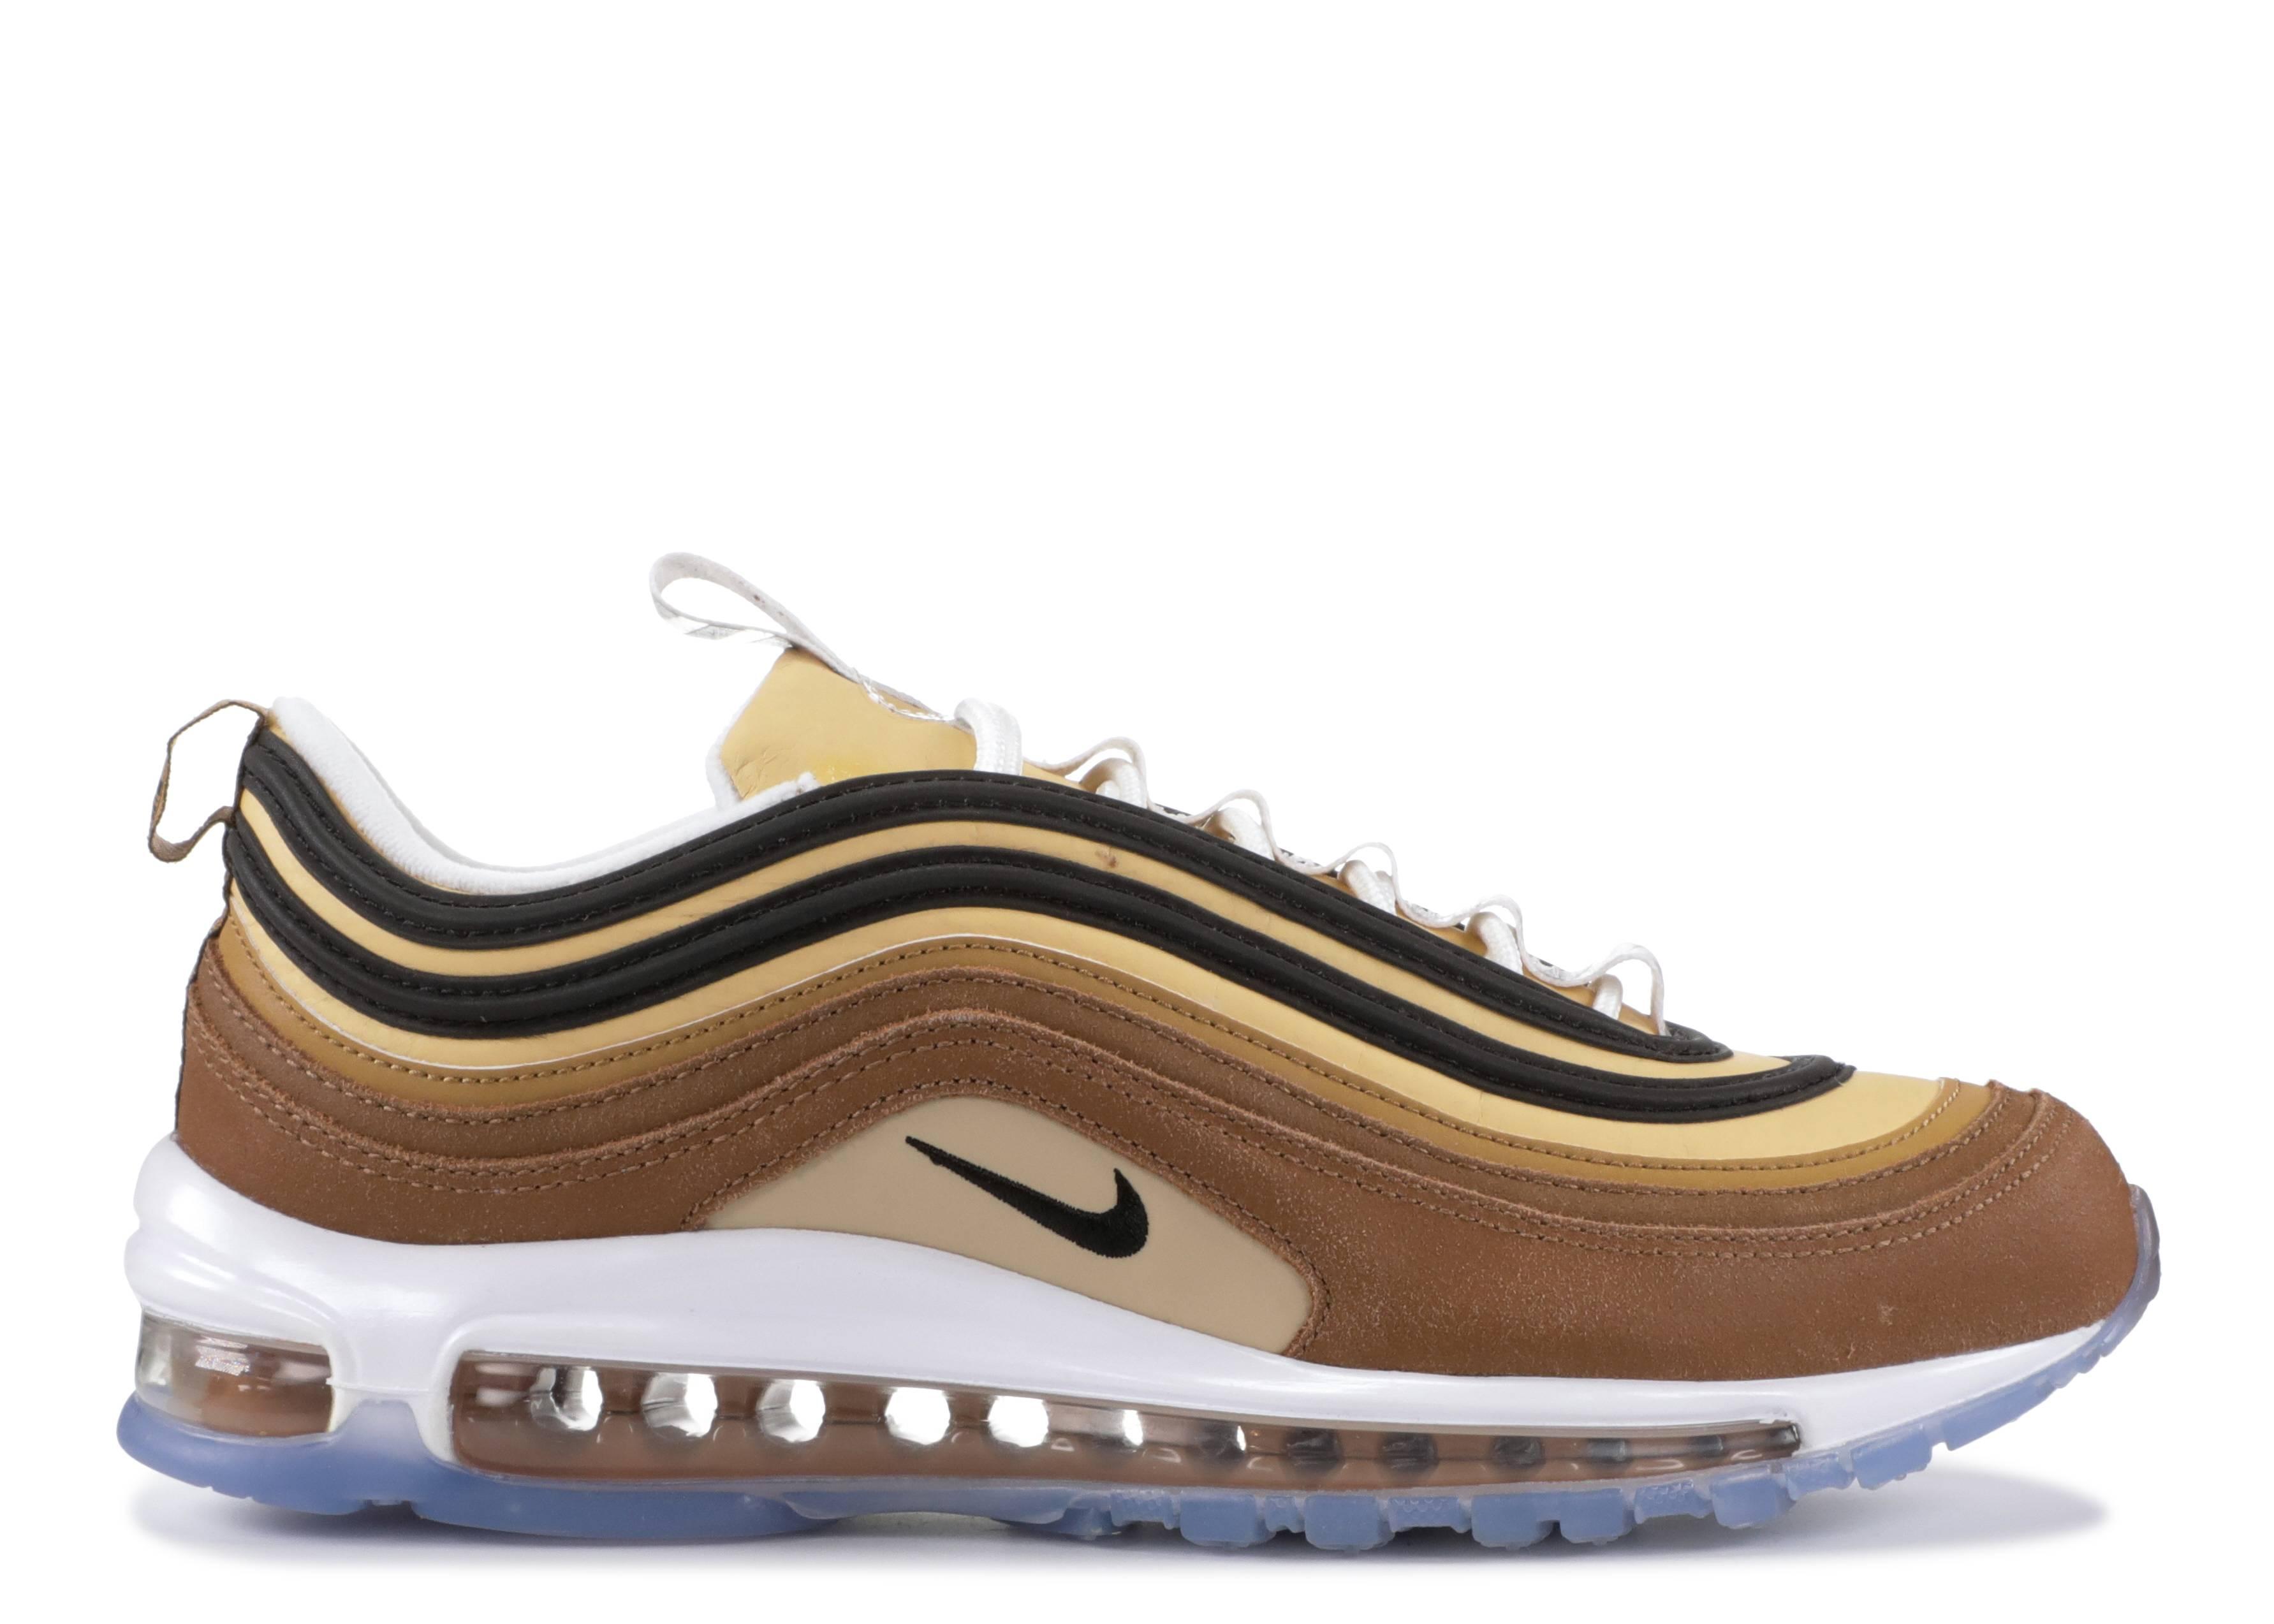 insondable sábado Limpiamente  Air Max 97 'Unboxed' - Nike - 921826 201 - ale brown/black-elemental gold |  Flight Club